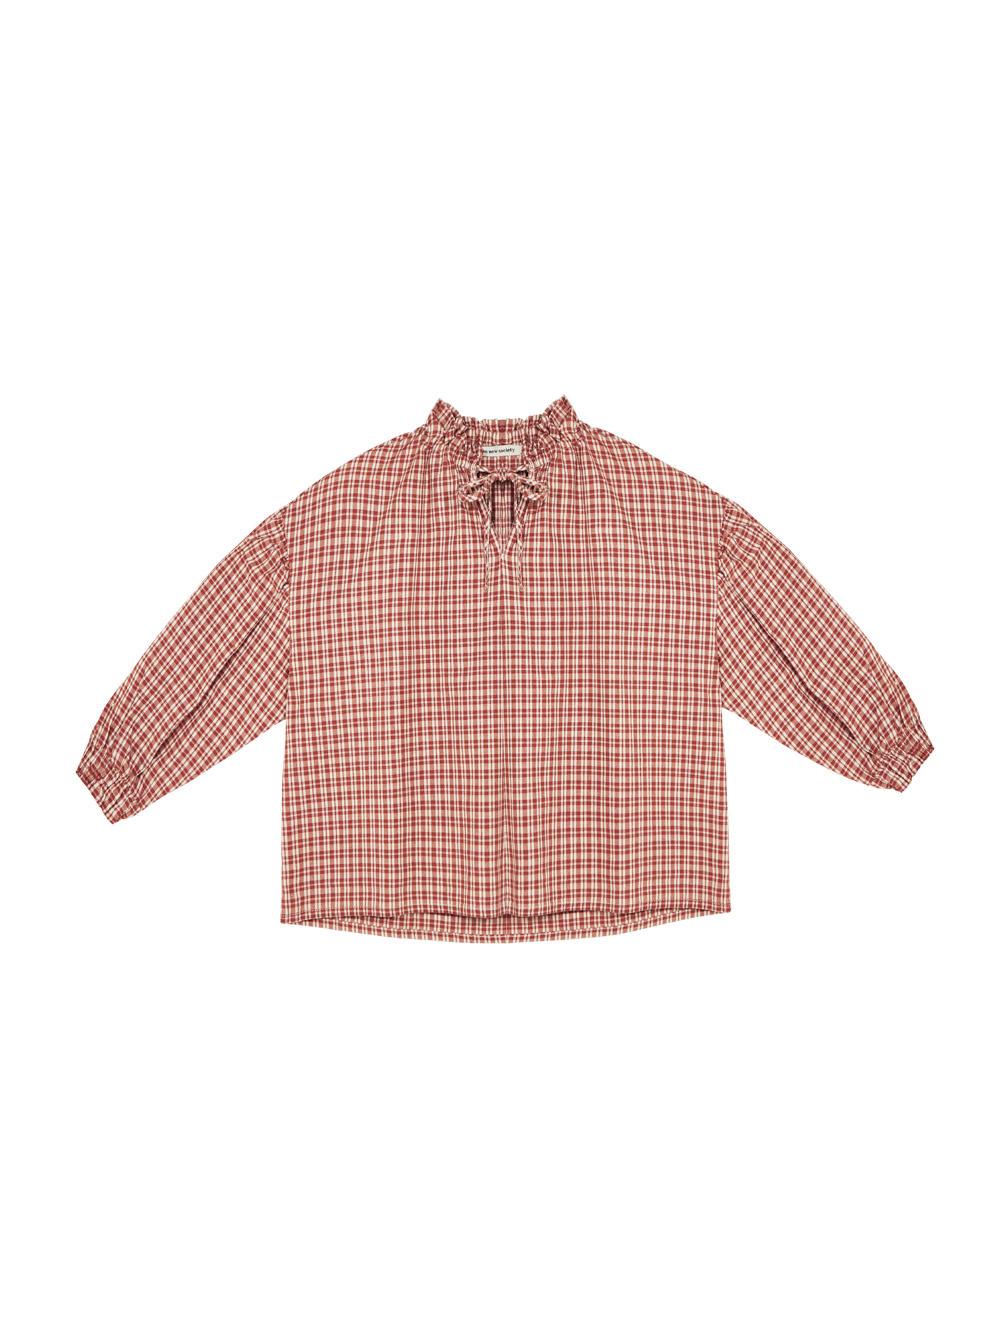 Olivia blouse - Caramel Check-1